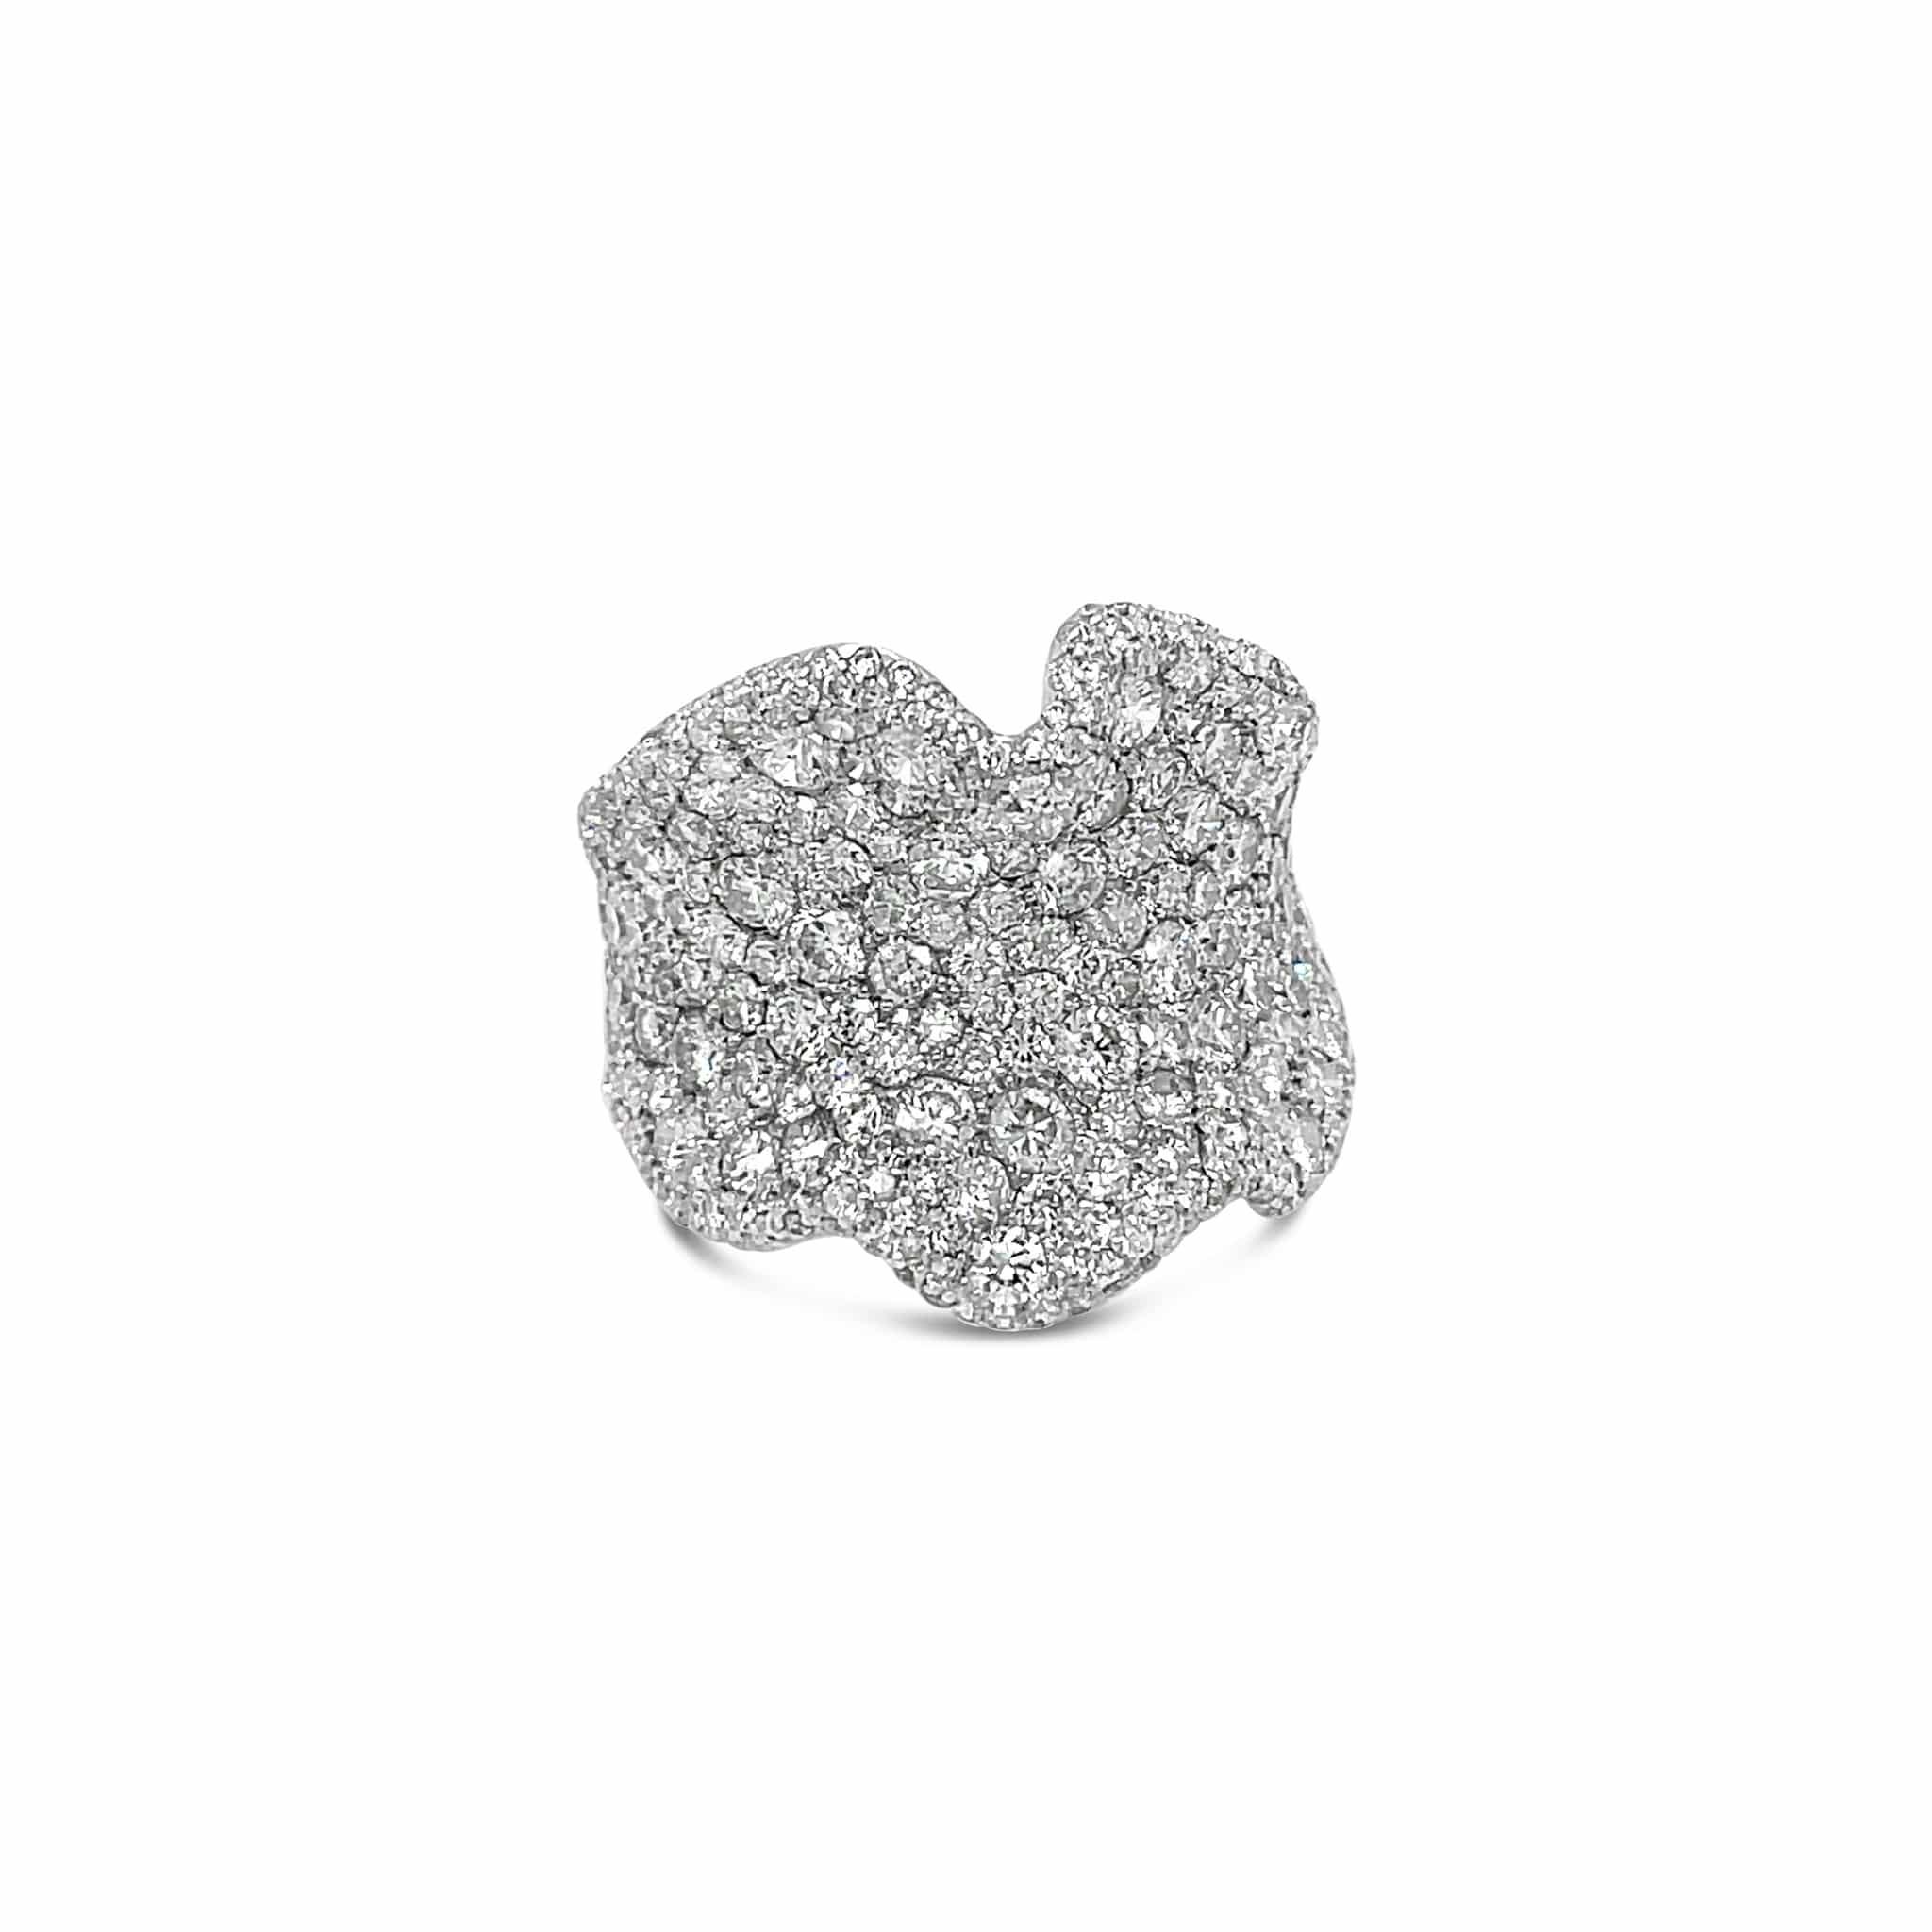 Salavetti Diamond Cocktail Ring